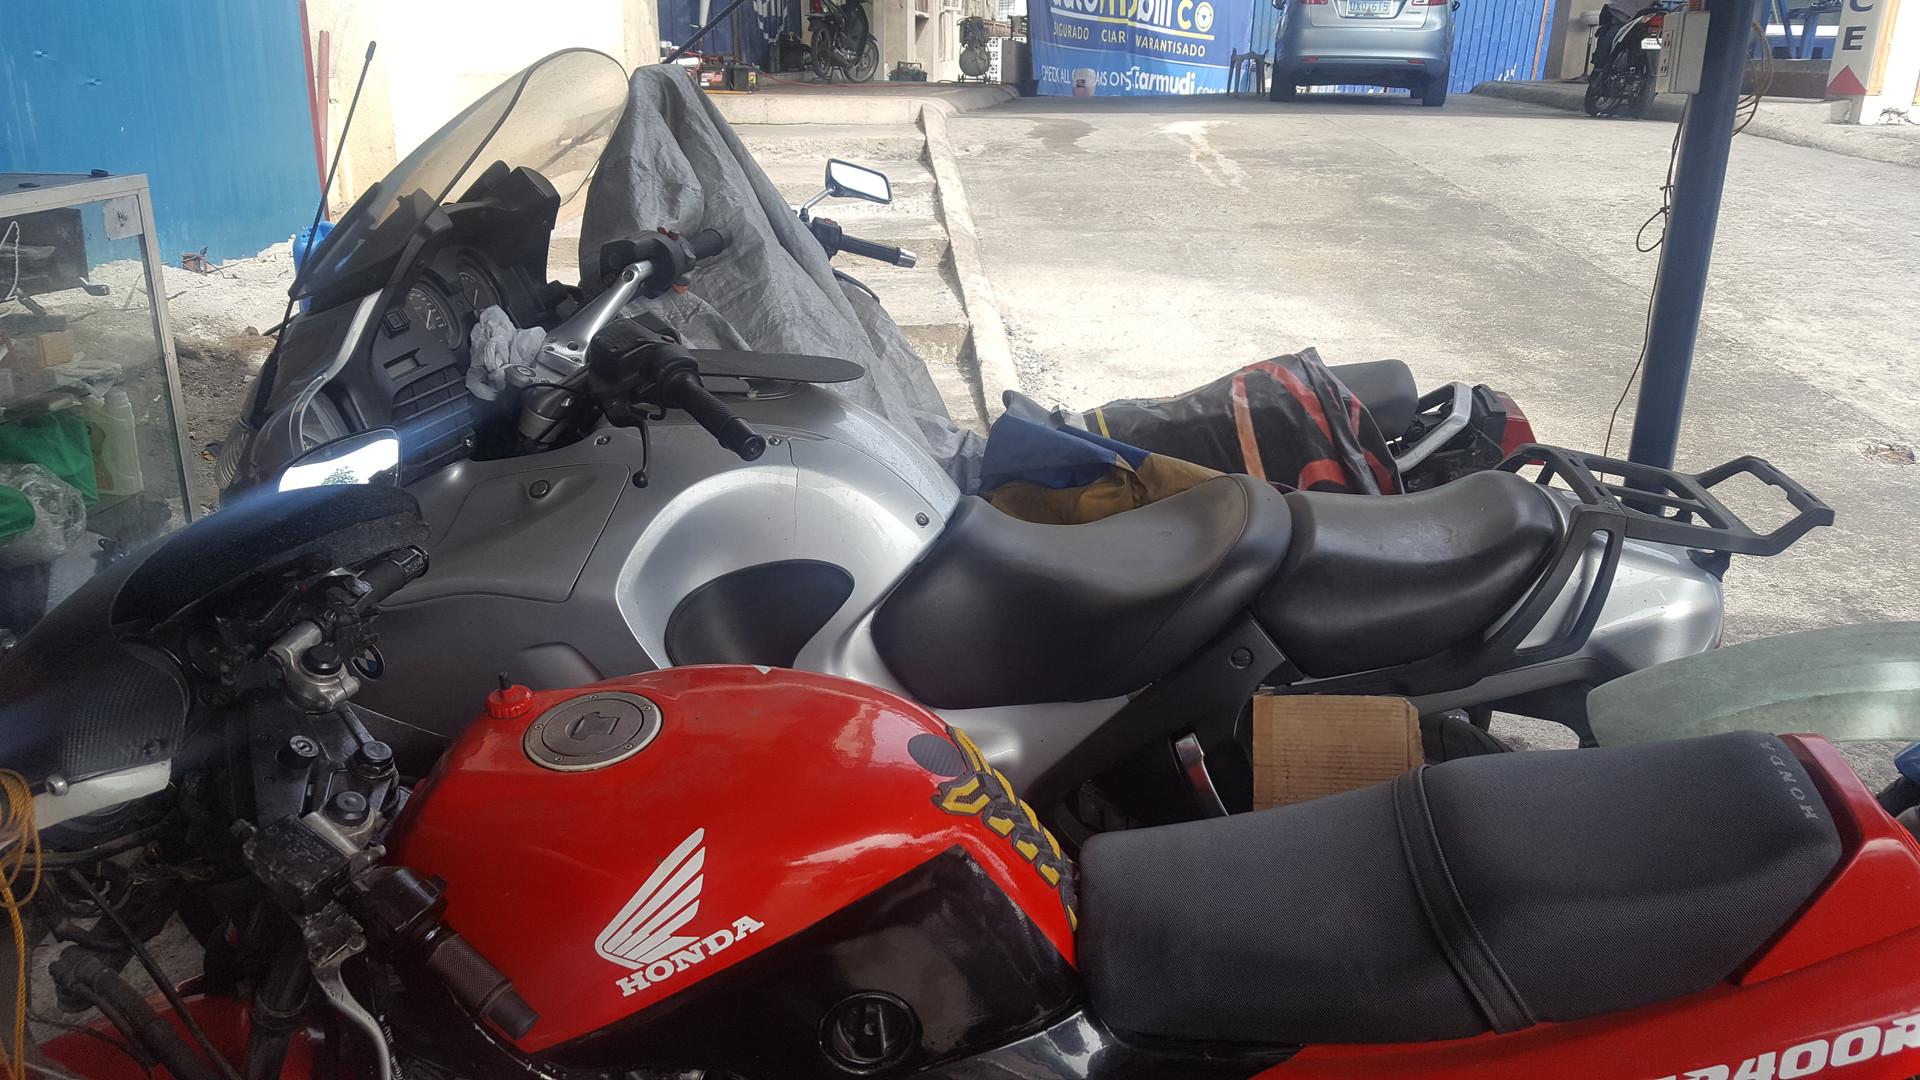 Bikes awaiting spares